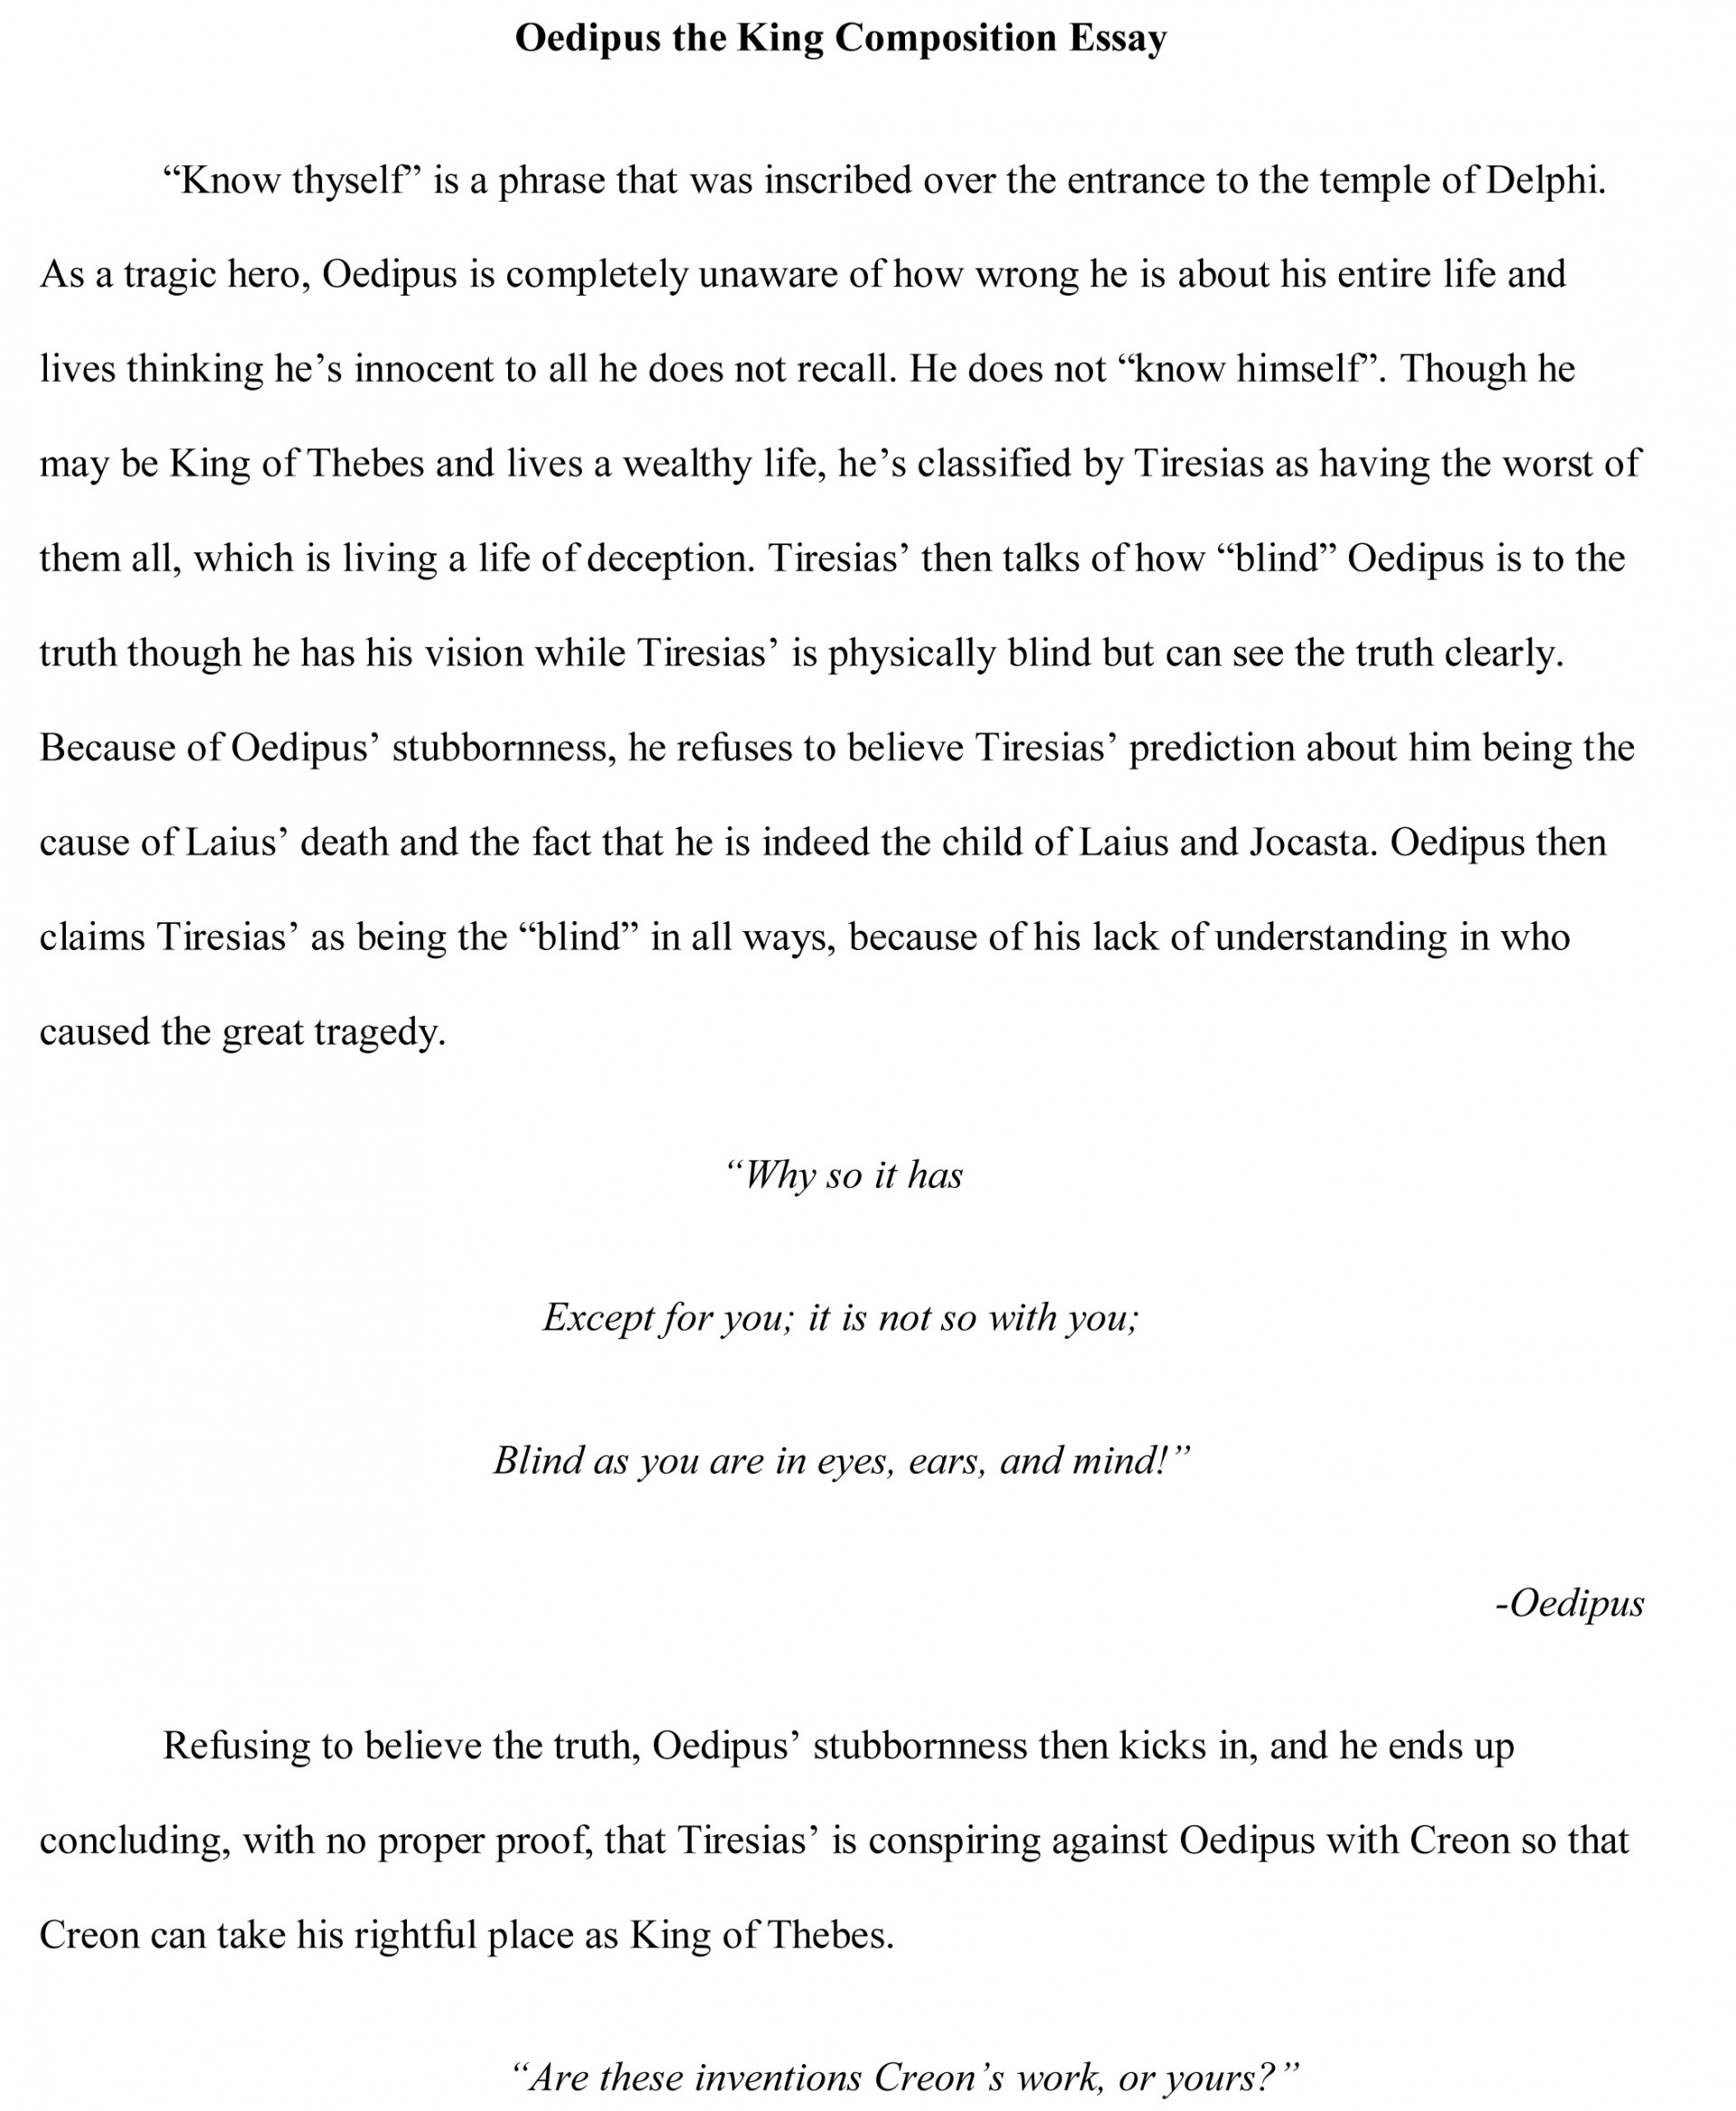 007 Best Essays Oedipus Essay Free Sample Breathtaking 2016 The American Audiobook Short Pdf 1920